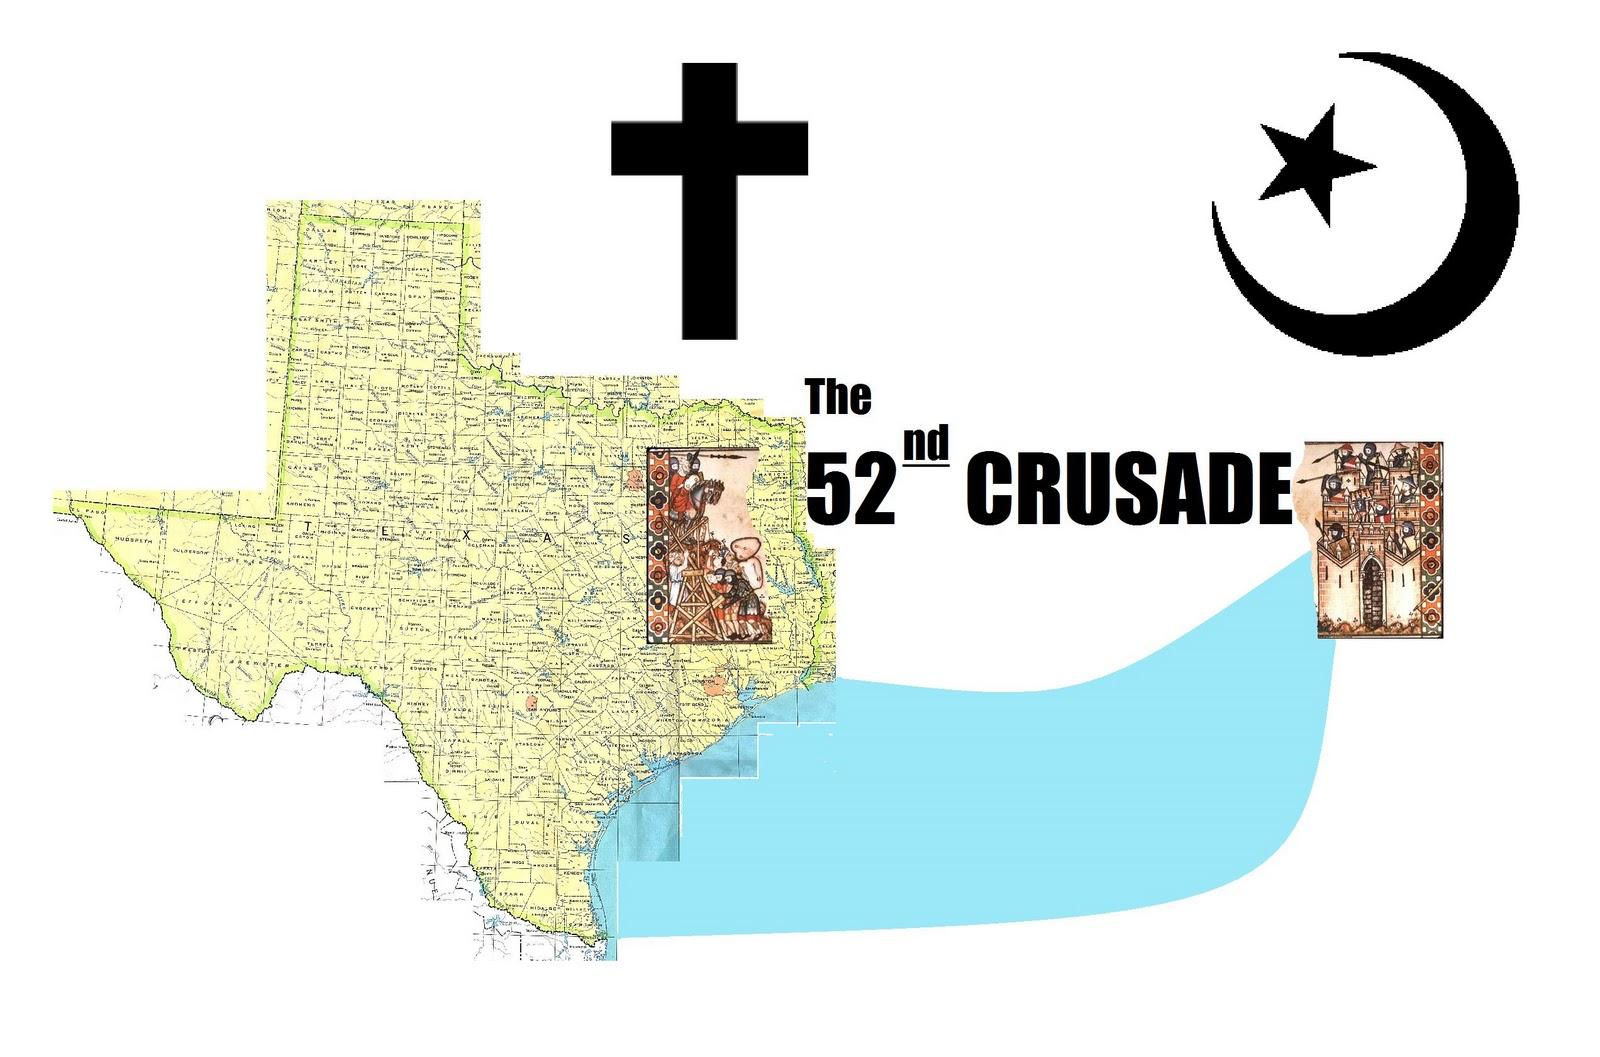 http://3.bp.blogspot.com/_GqGEPRWOfVA/TKOTdeQu7TI/AAAAAAAACvg/YH2Xgjuv32w/s1600/Crusade_52.jpg